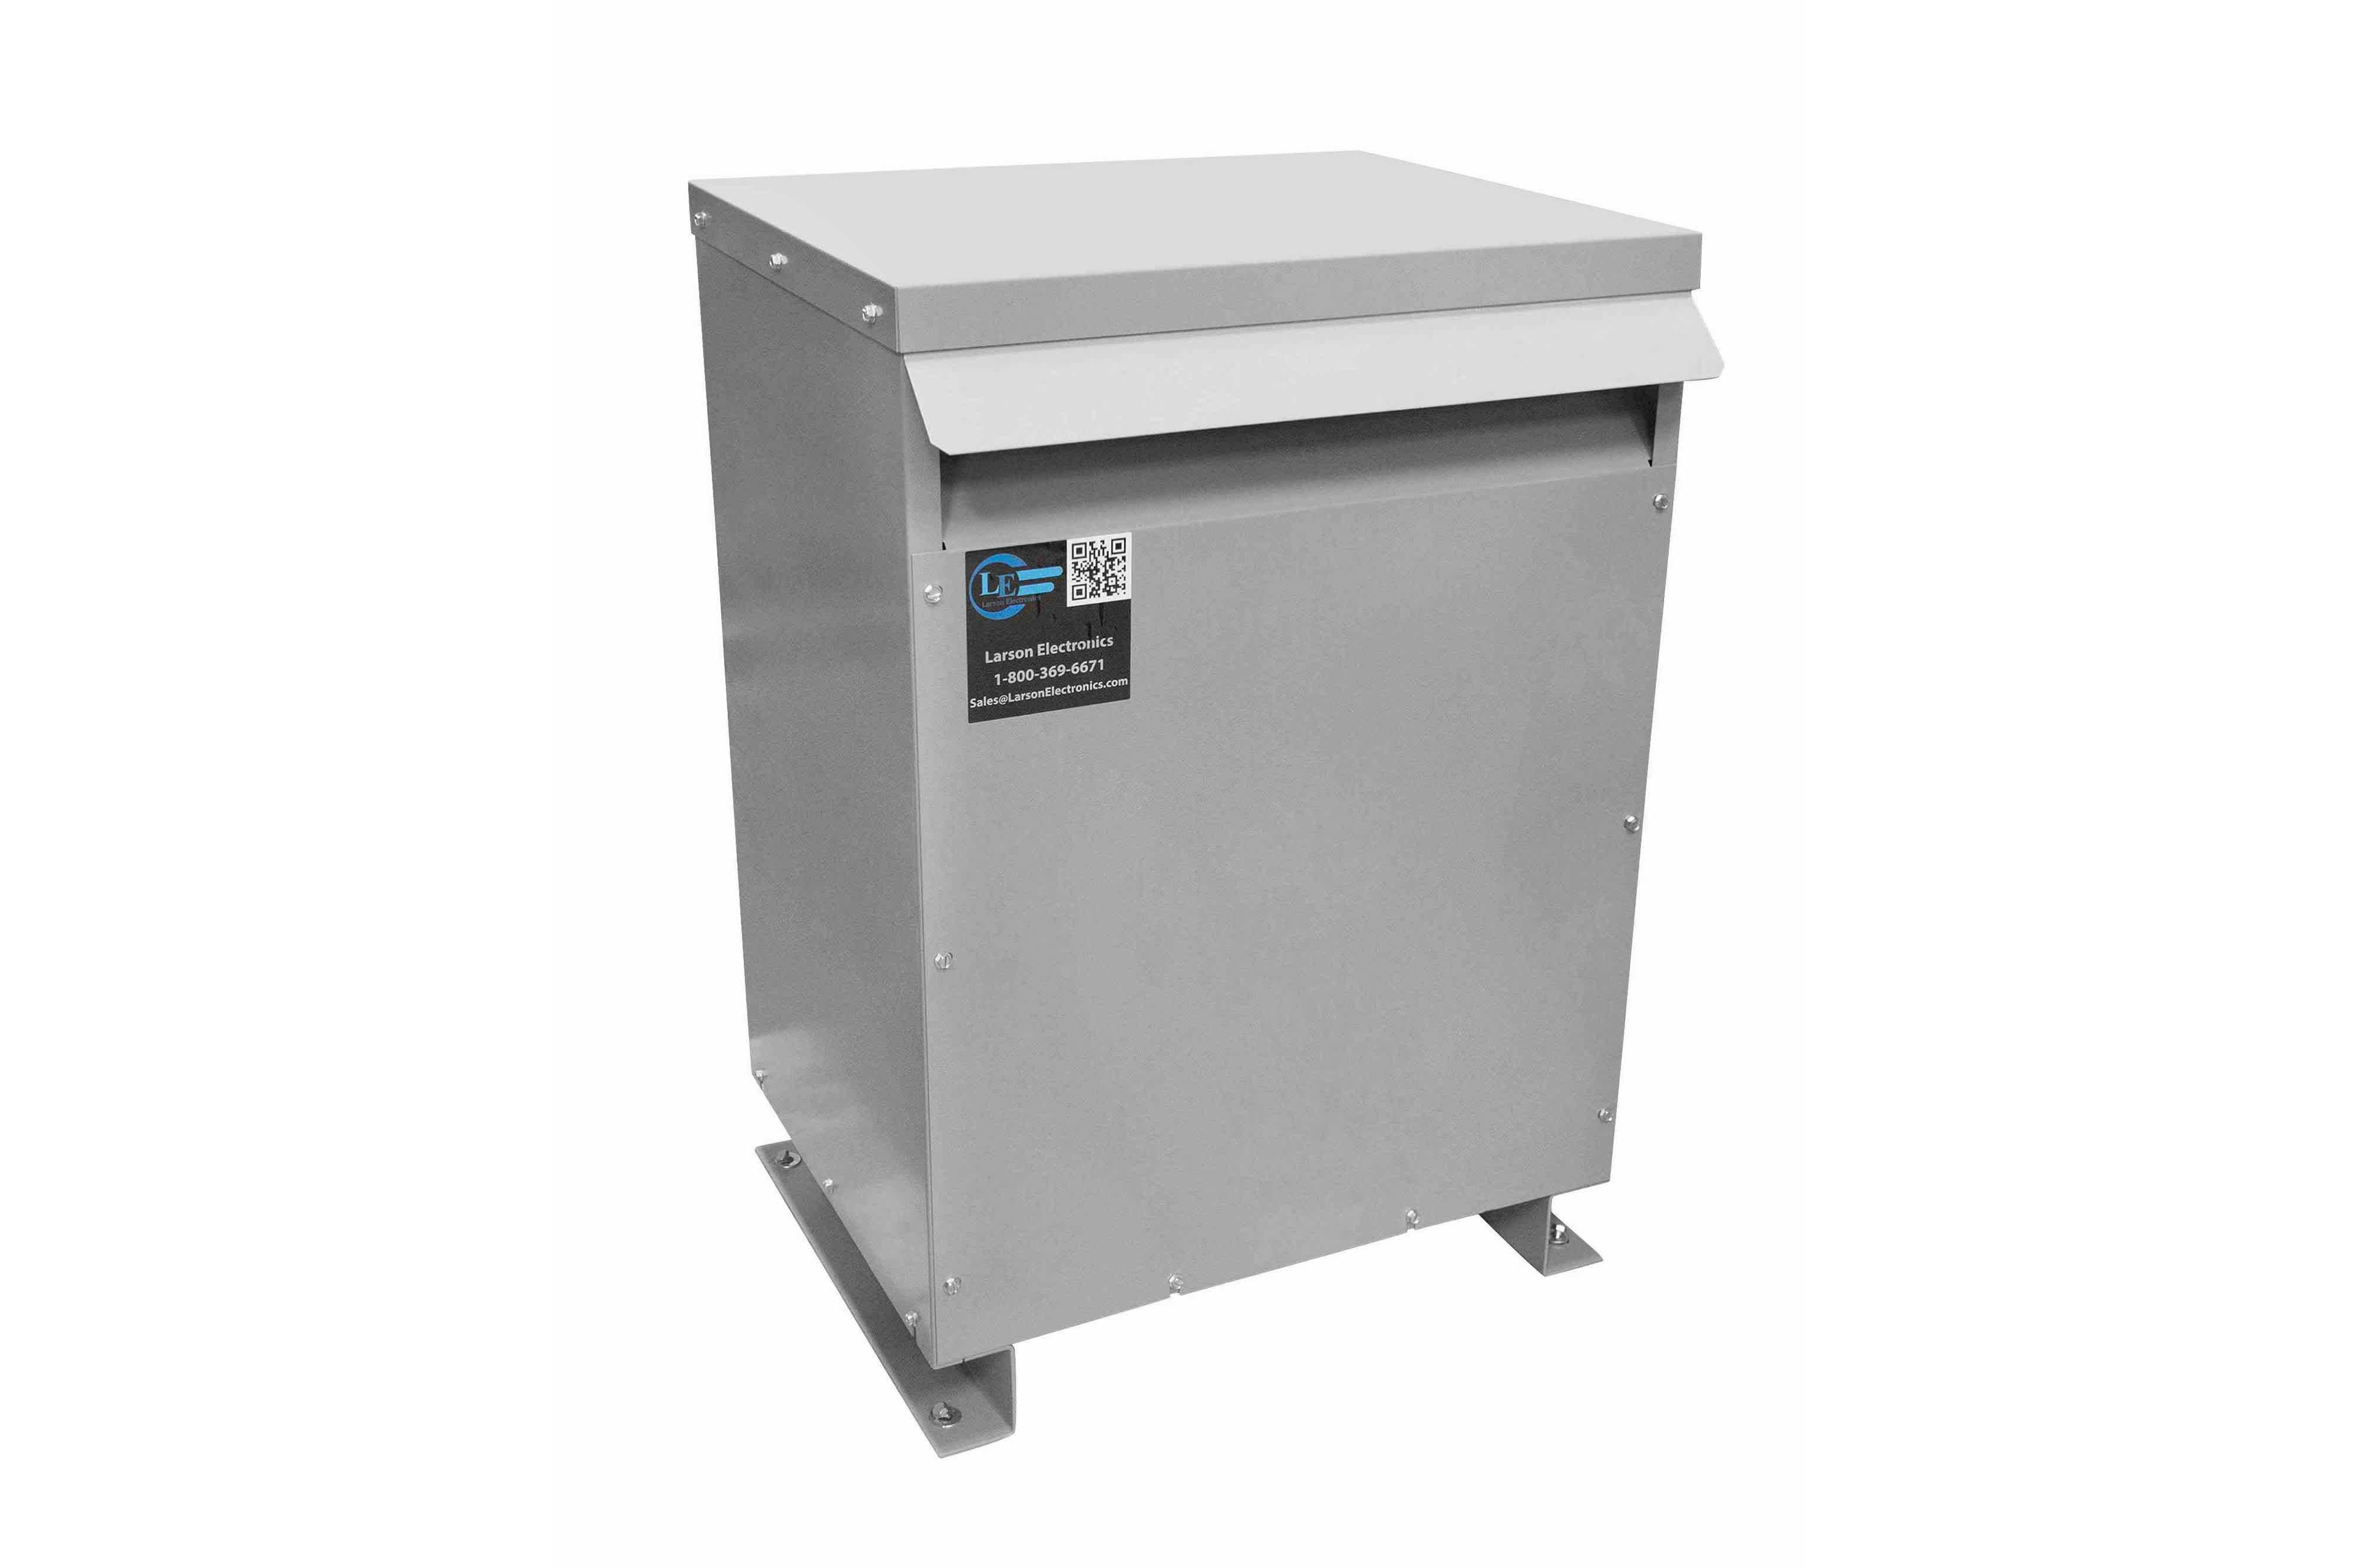 200 kVA 3PH Isolation Transformer, 240V Wye Primary, 415Y/240 Wye-N Secondary, N3R, Ventilated, 60 Hz